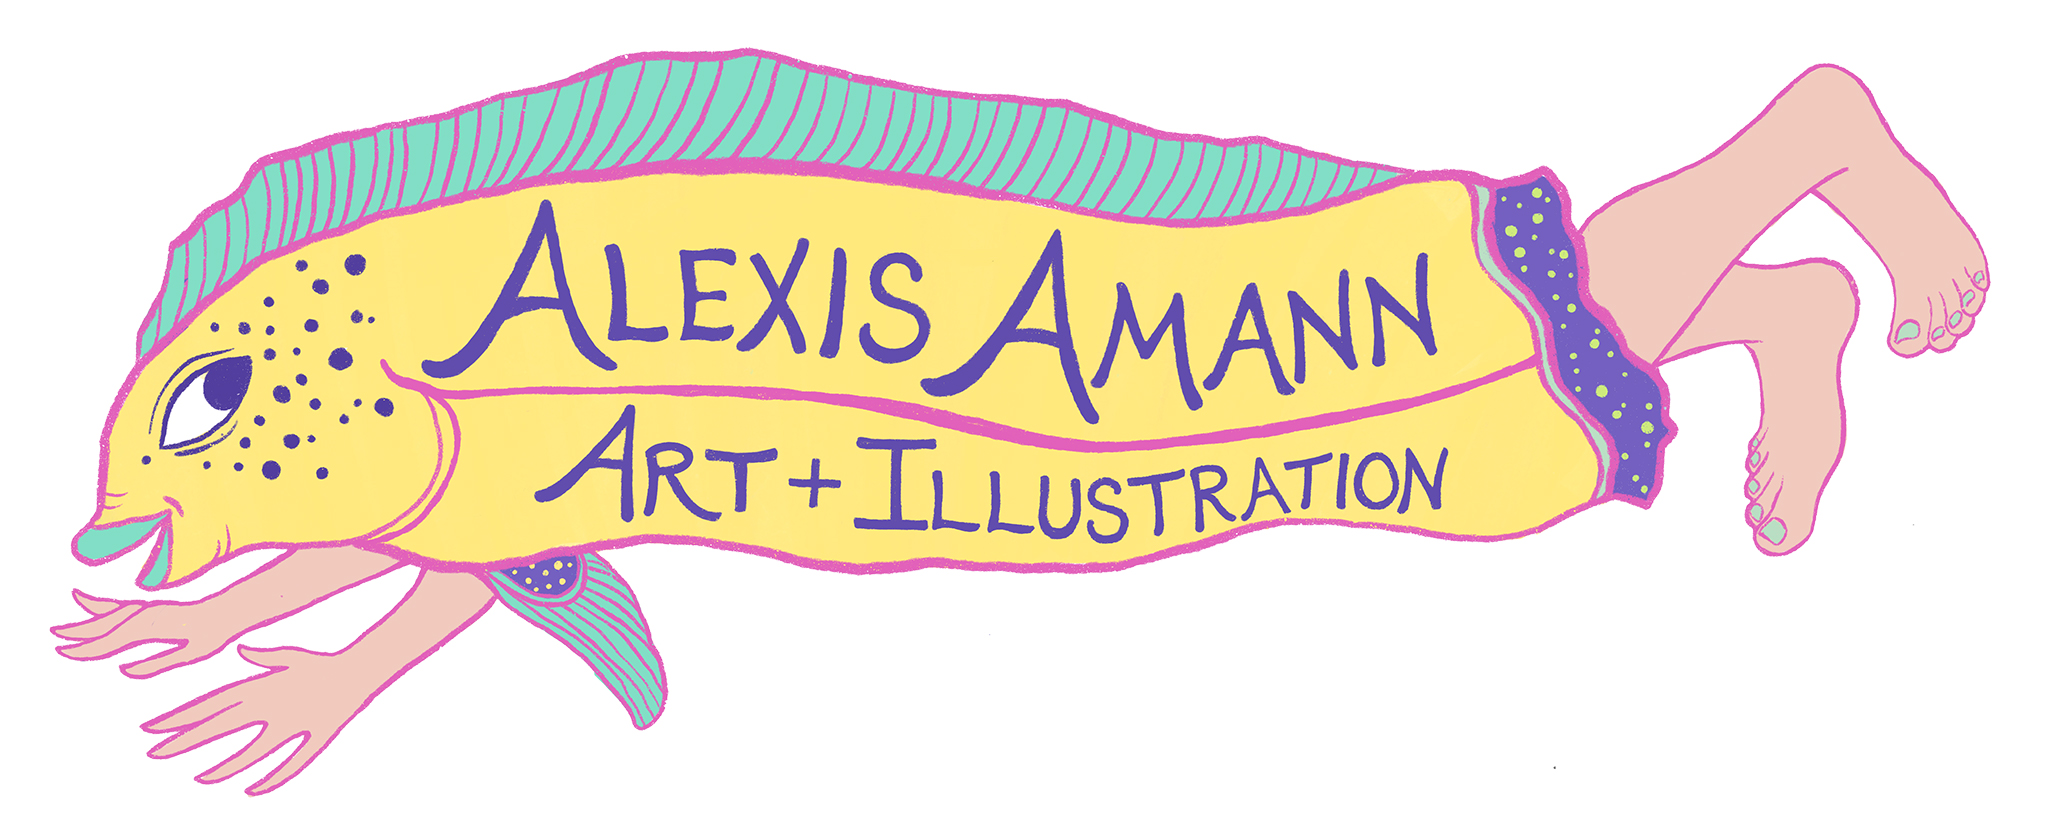 Alexis Amann Art and Illustration web.jpg